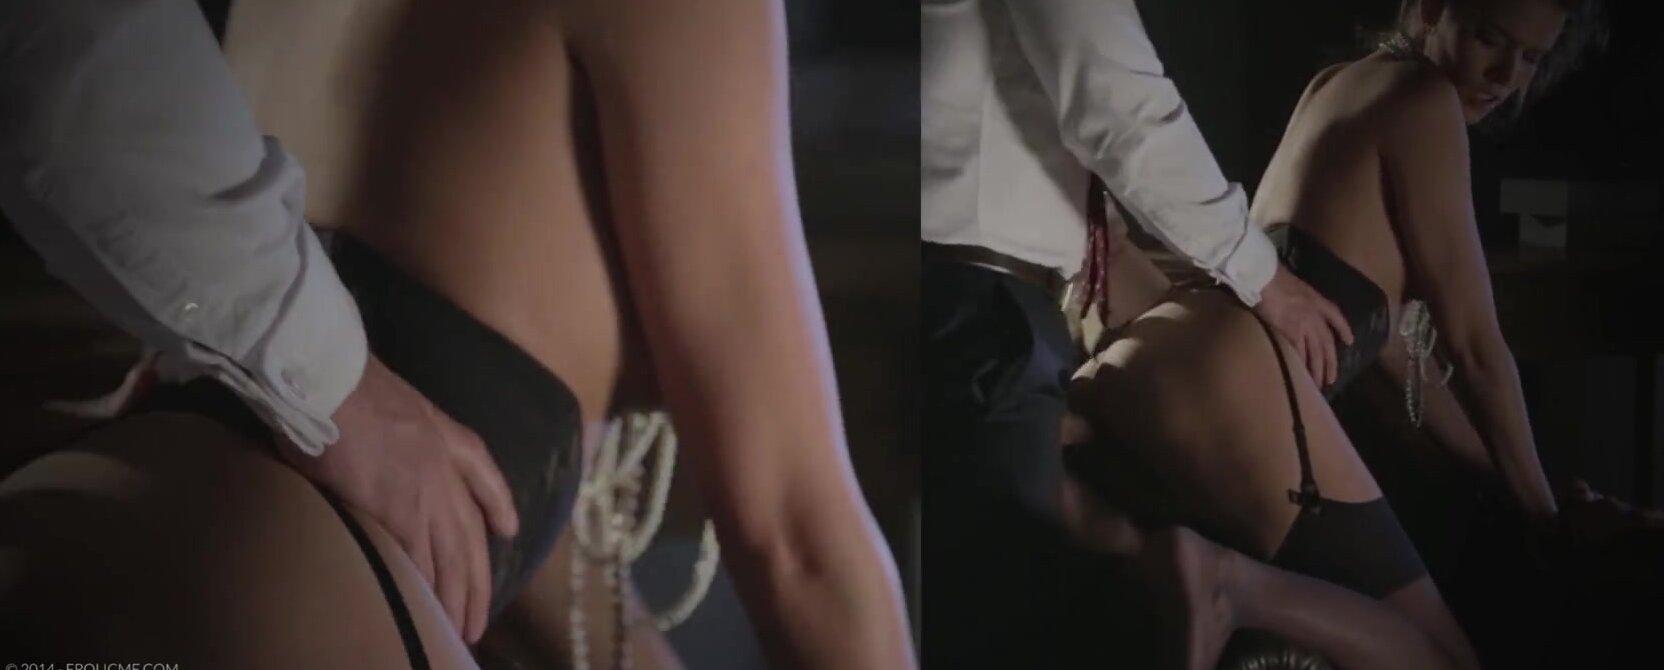 Красивое постелное секс видео